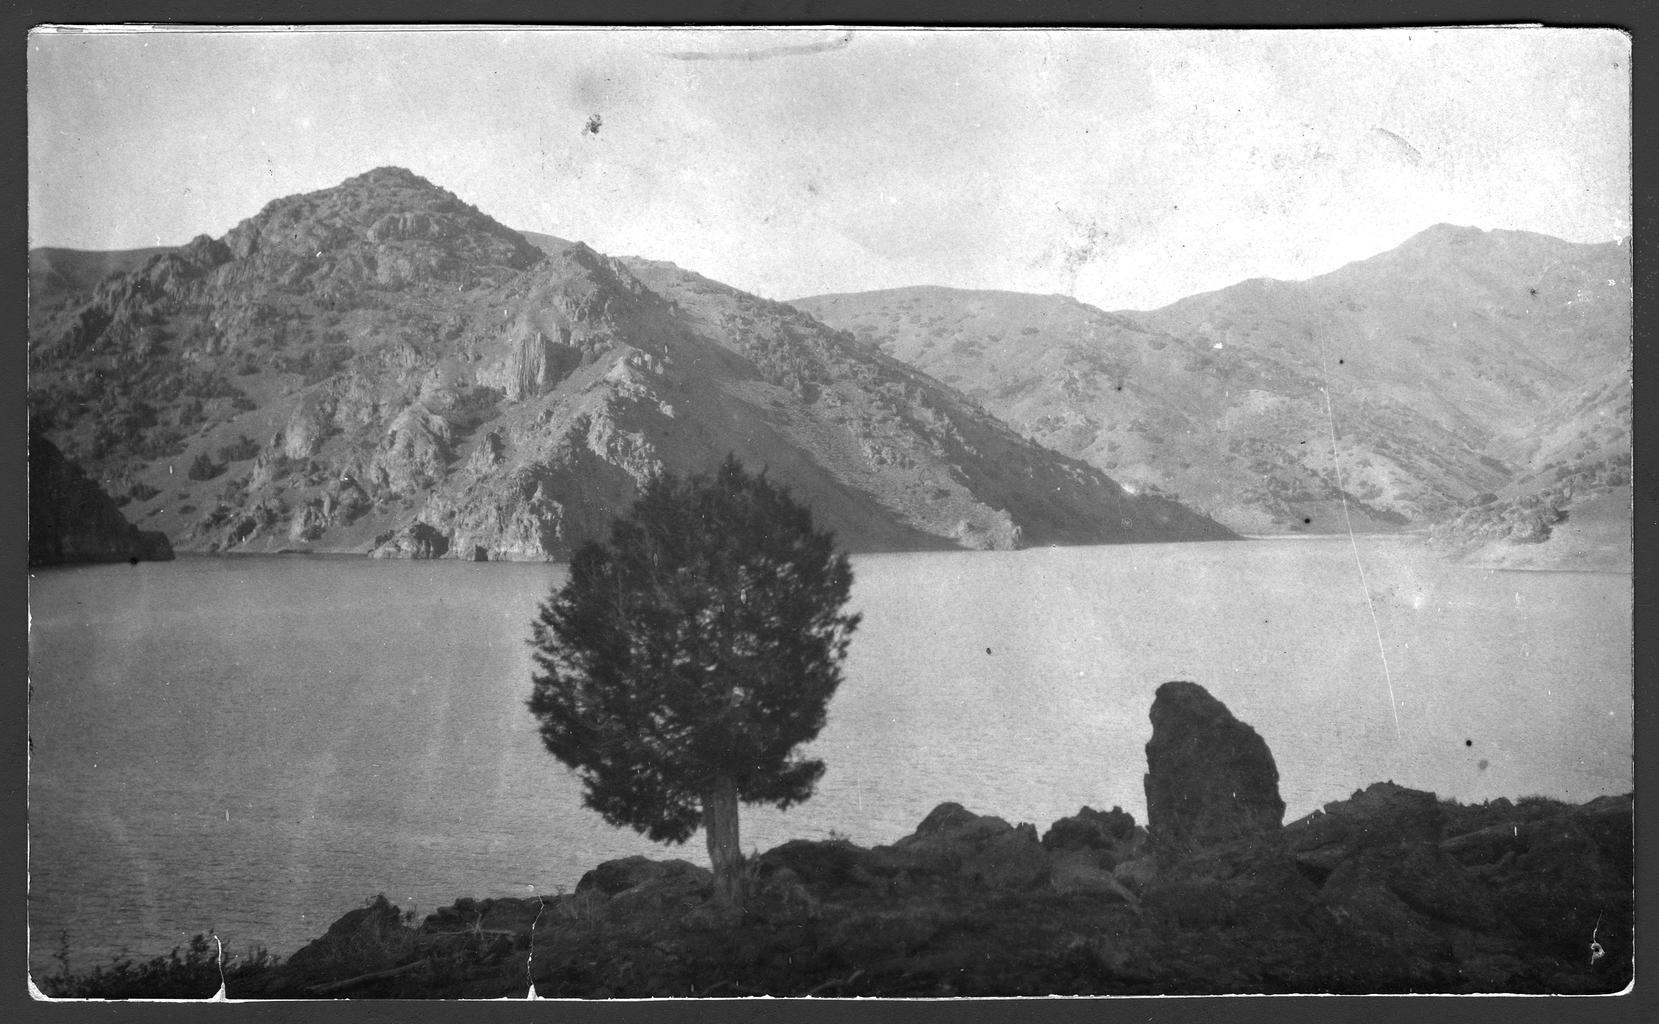 Вид на горную речку